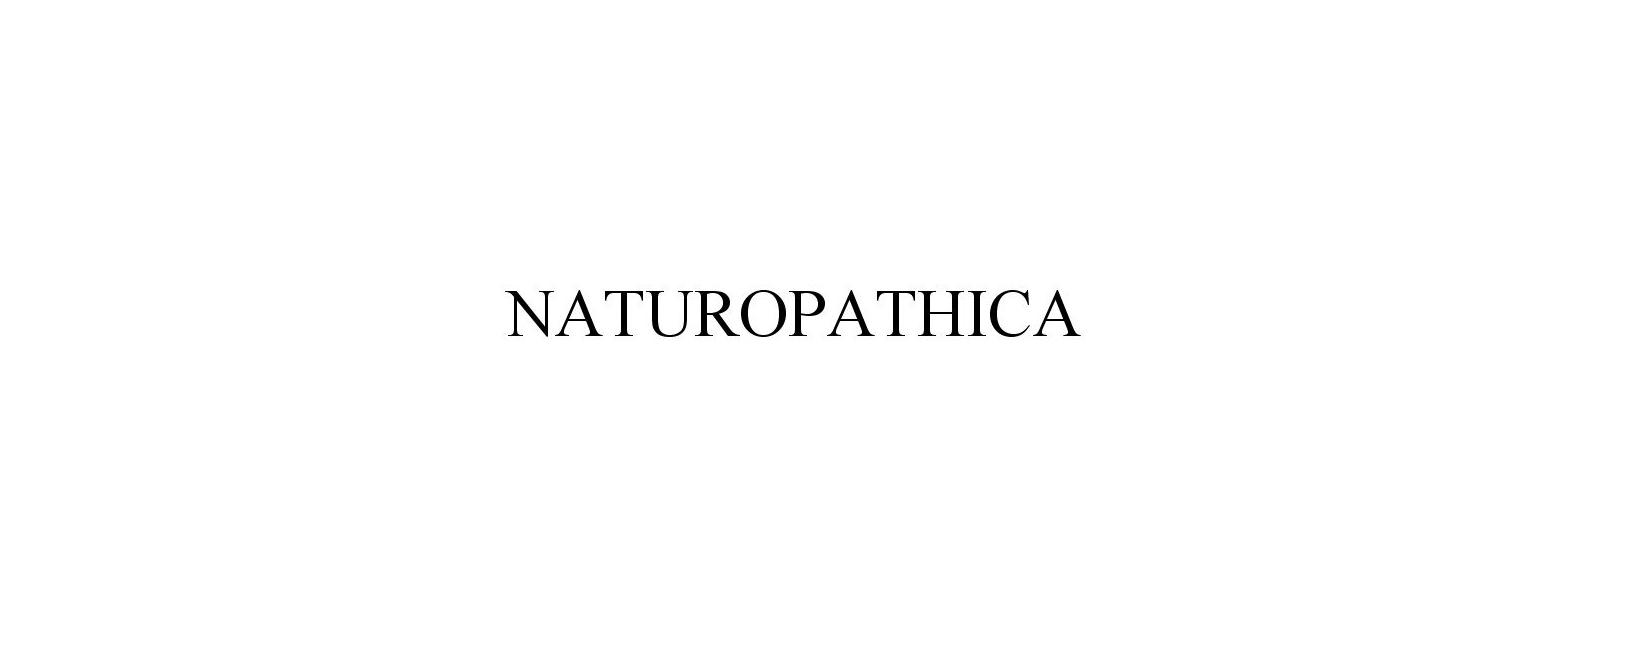 Naturopathica Discount Code 2021